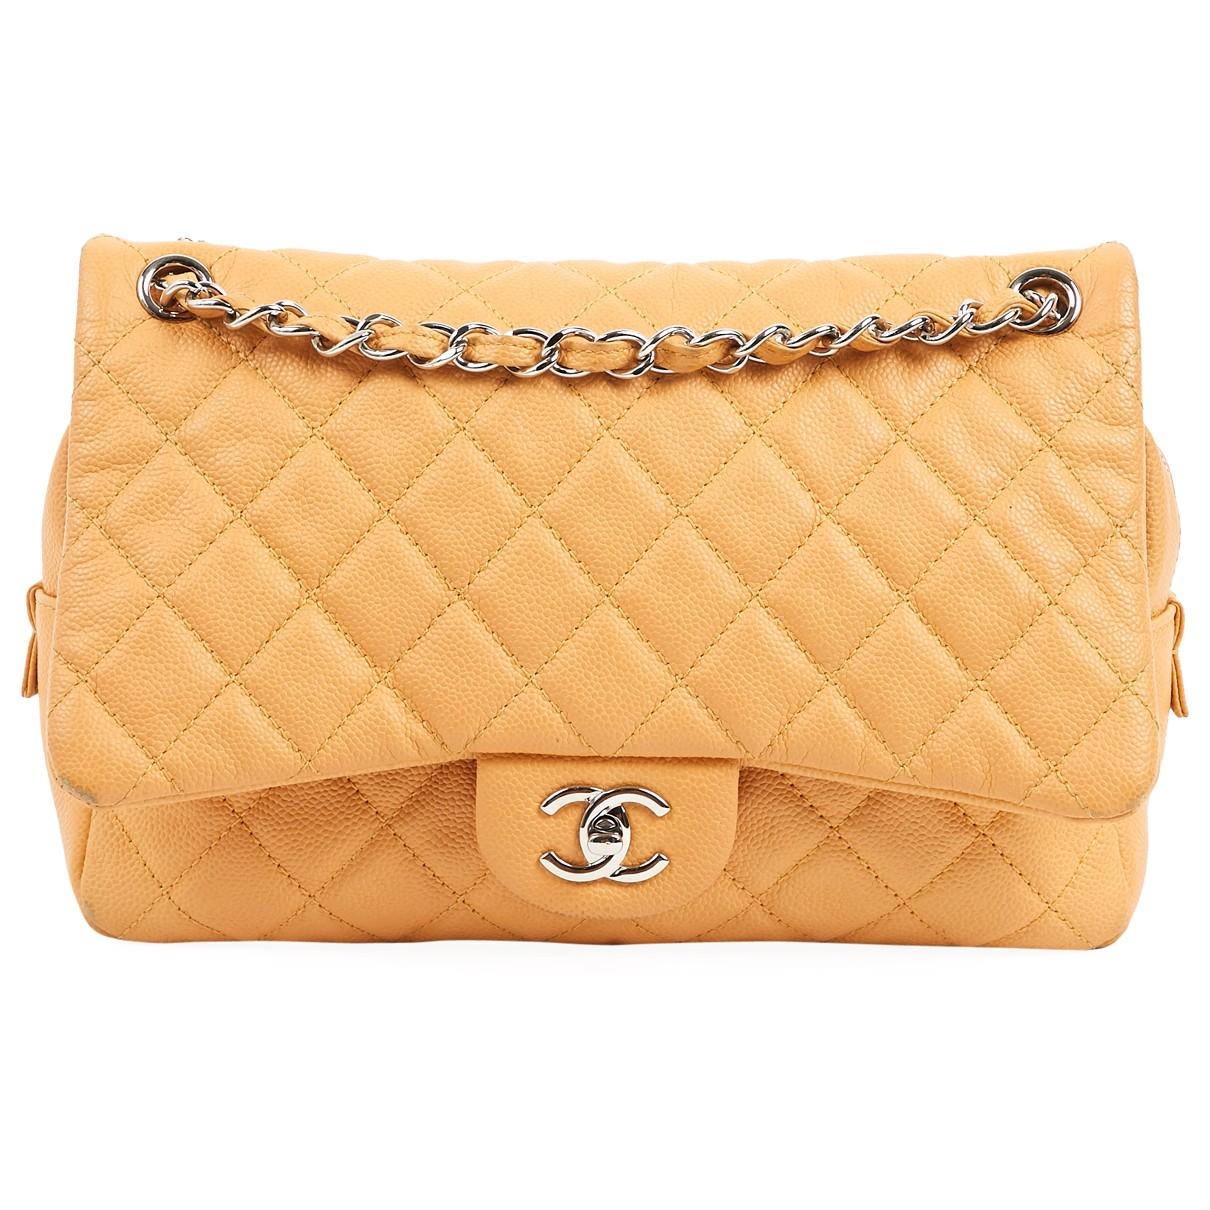 Chanel Timeless/Classique Beige Leather handbag for Women \N